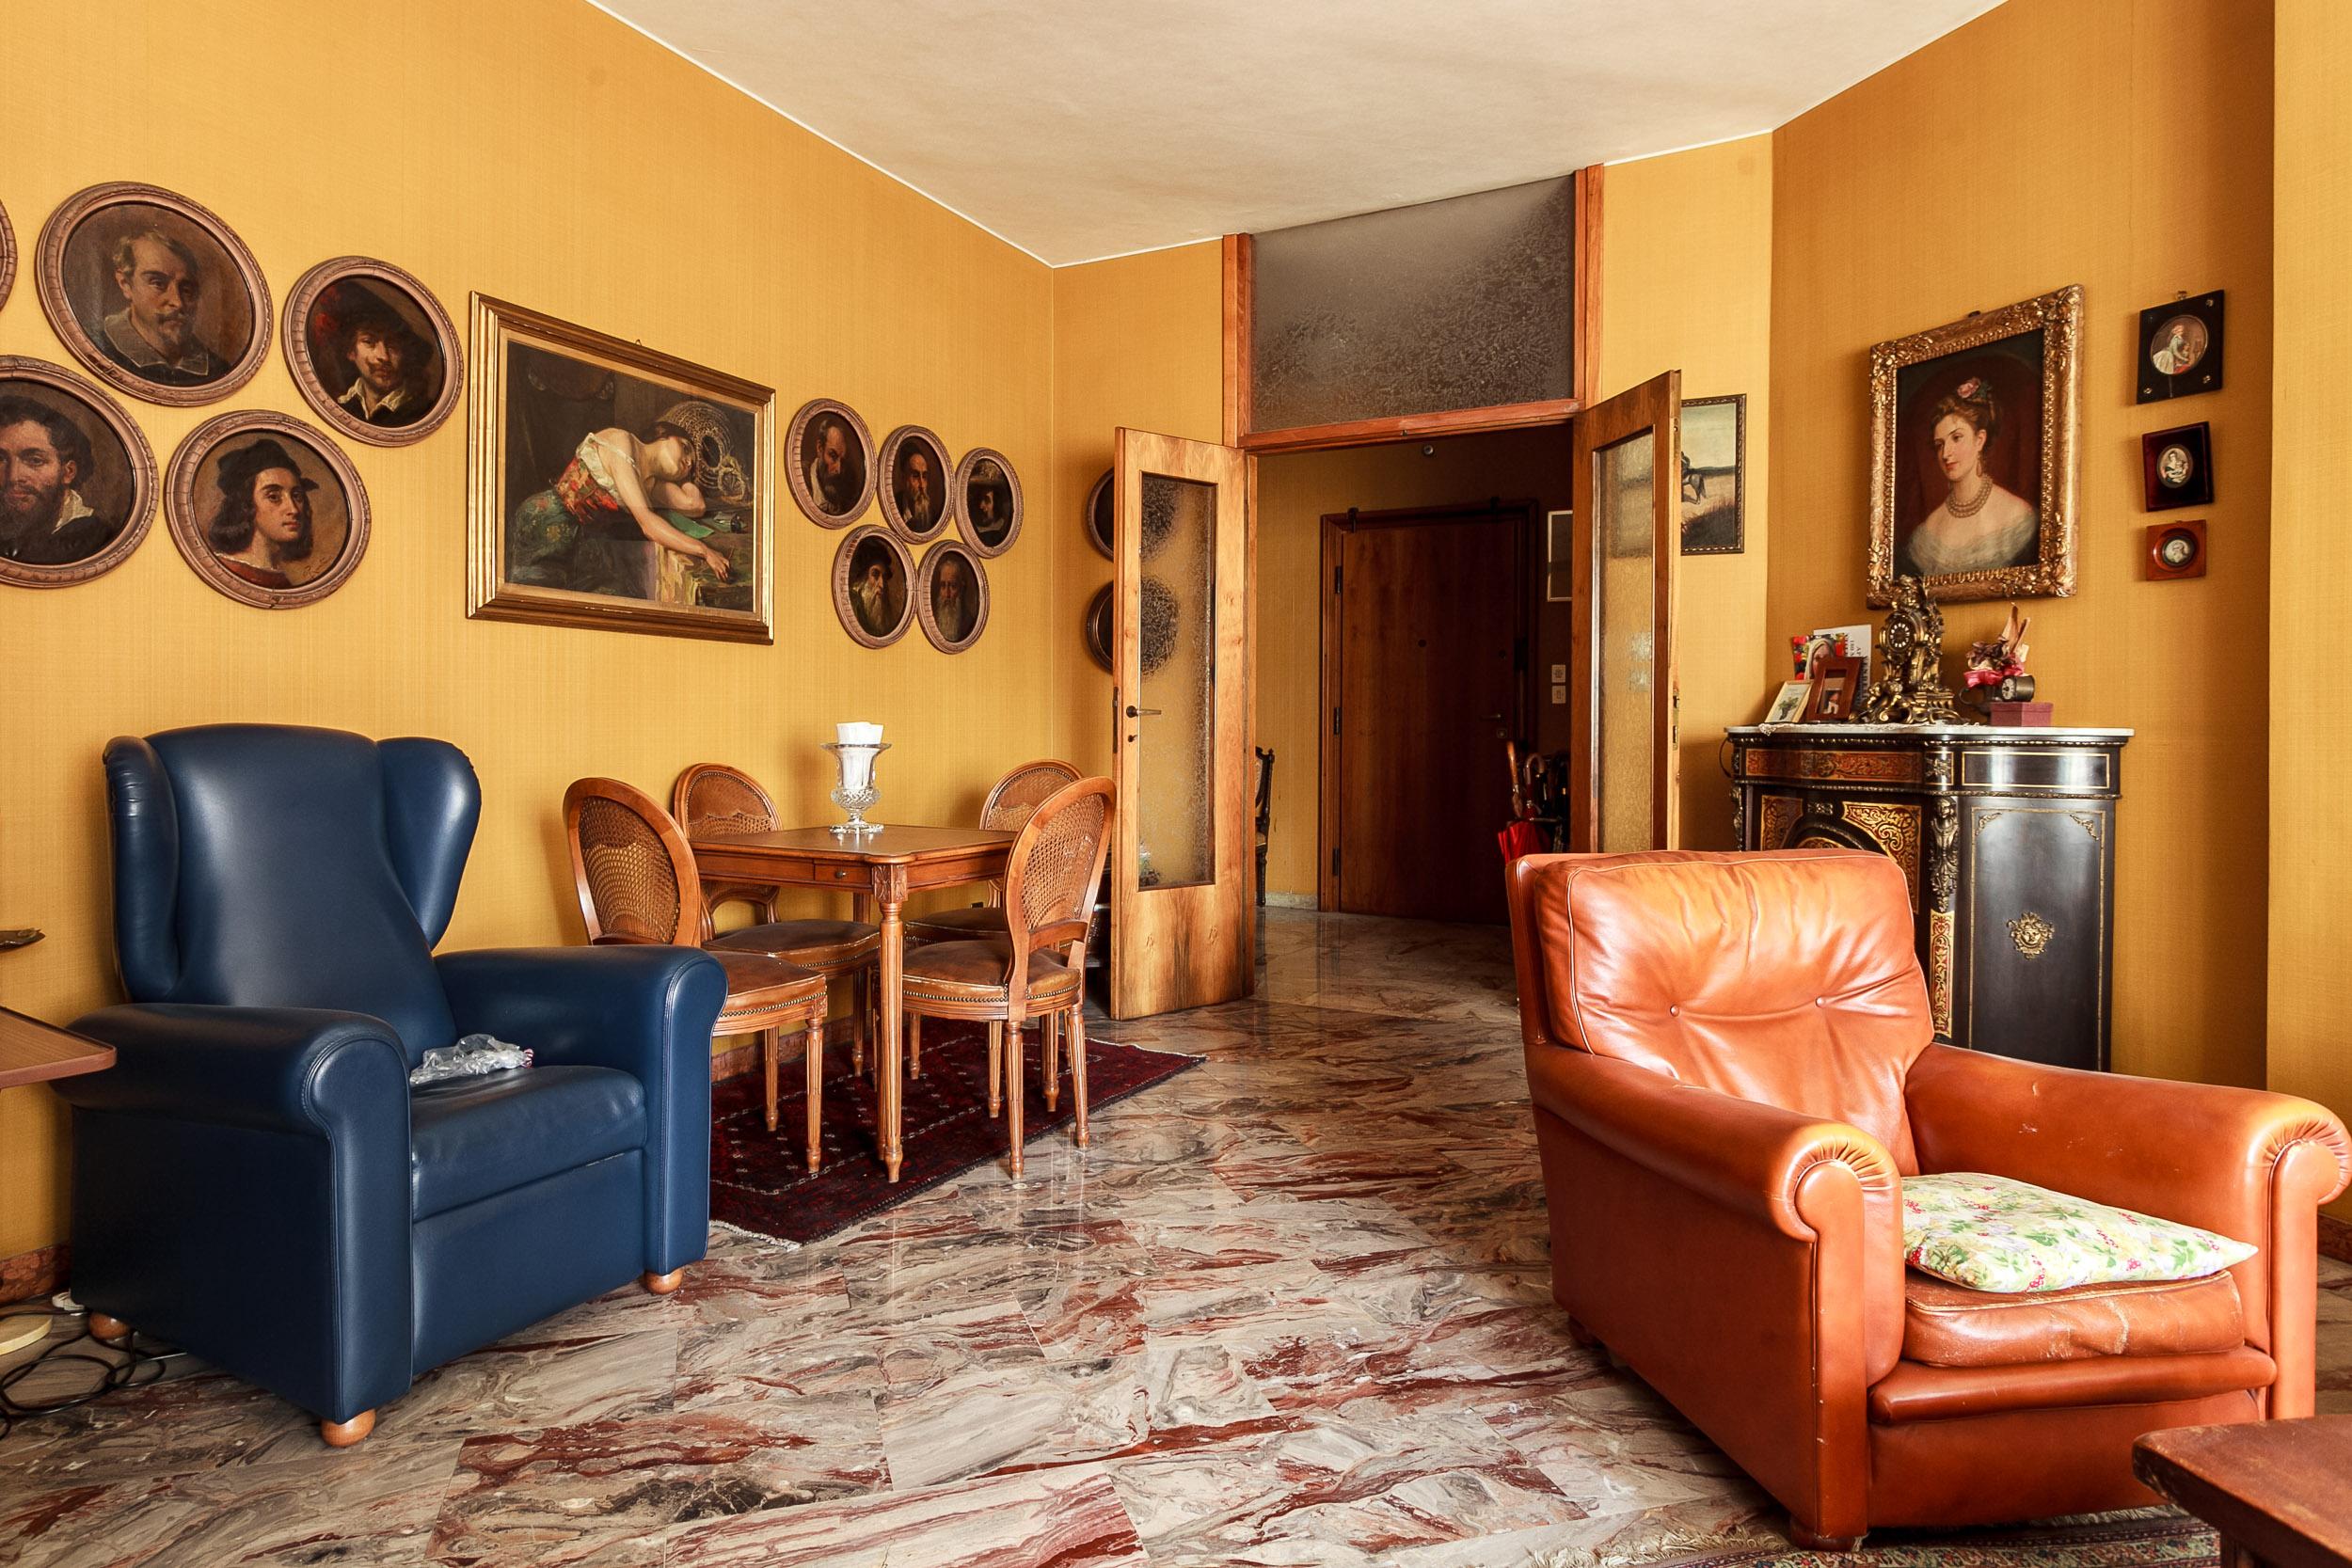 Via Dante,Centro Sud,7 Rooms Rooms,Residenziale,1139